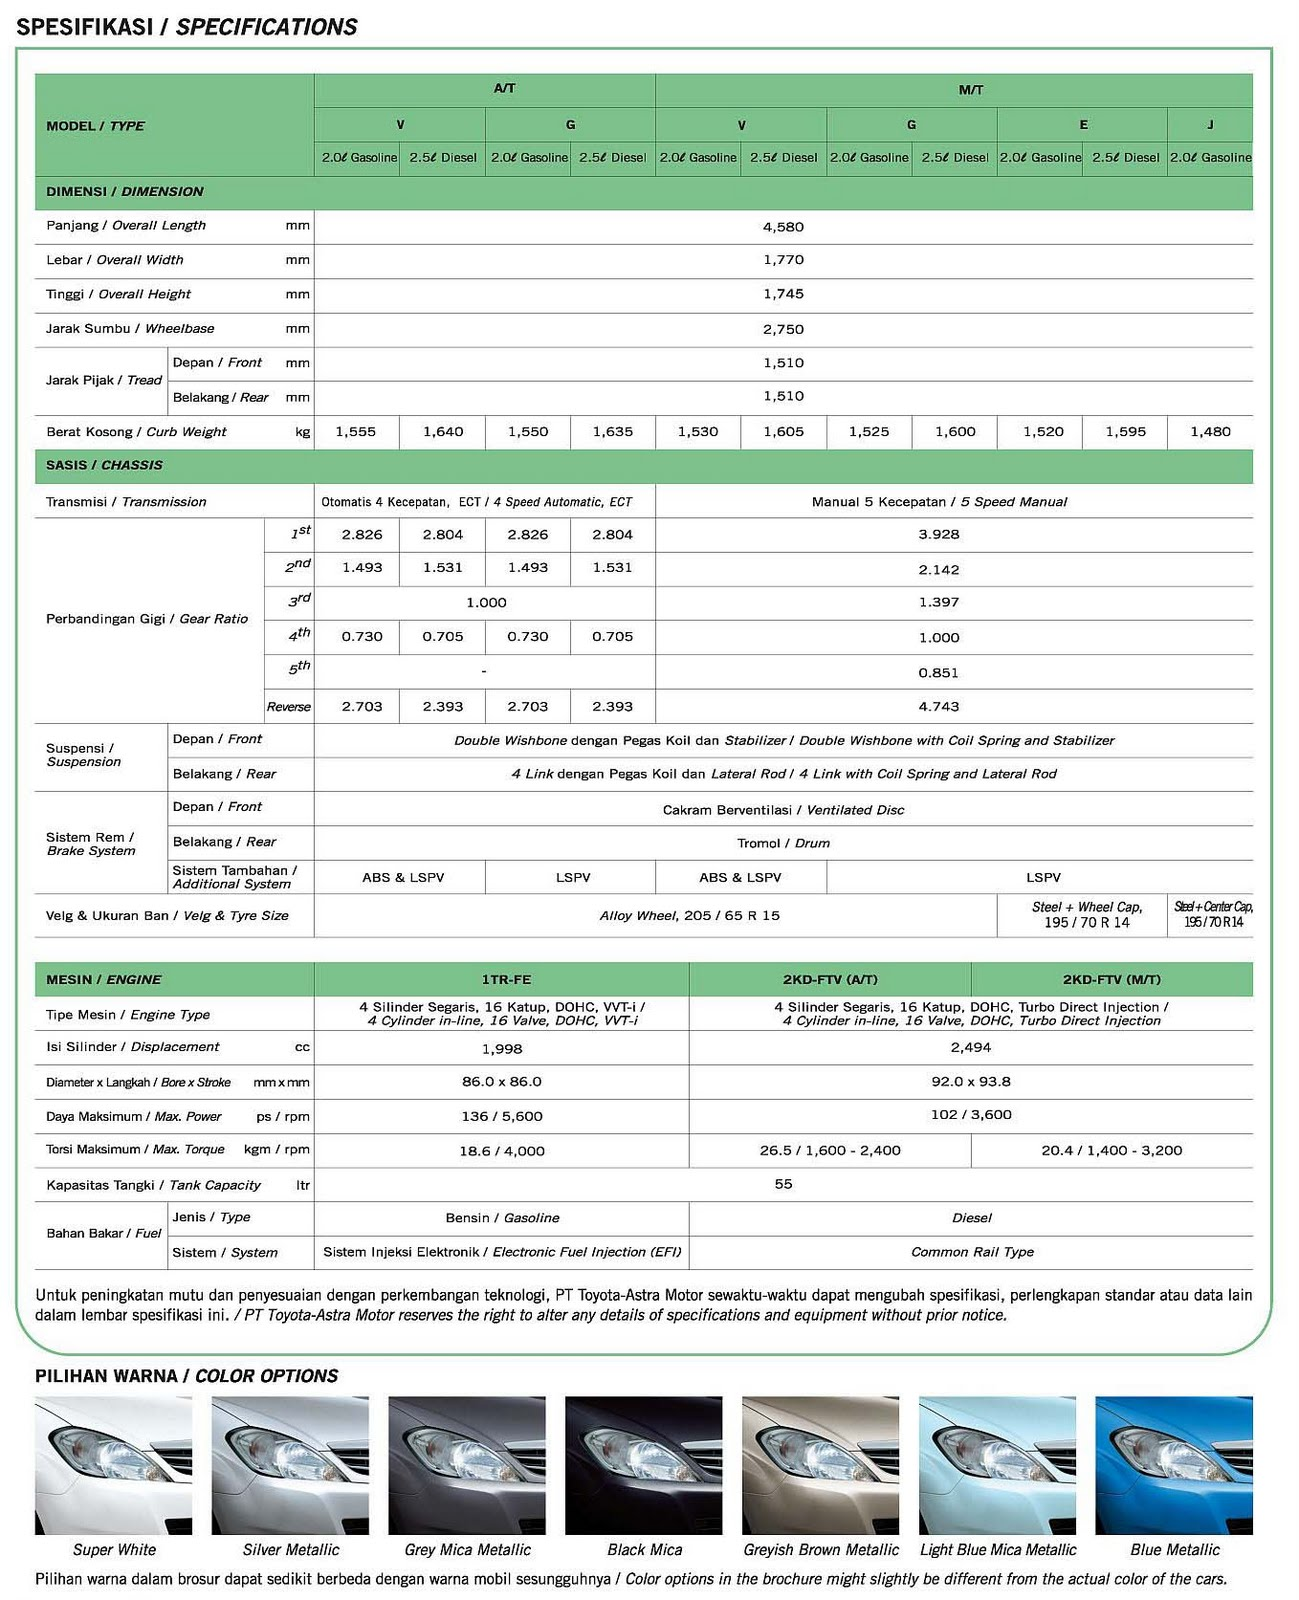 new kijang innova spesifikasi corolla altis launch date in india toyota triple amazing riau alfi info